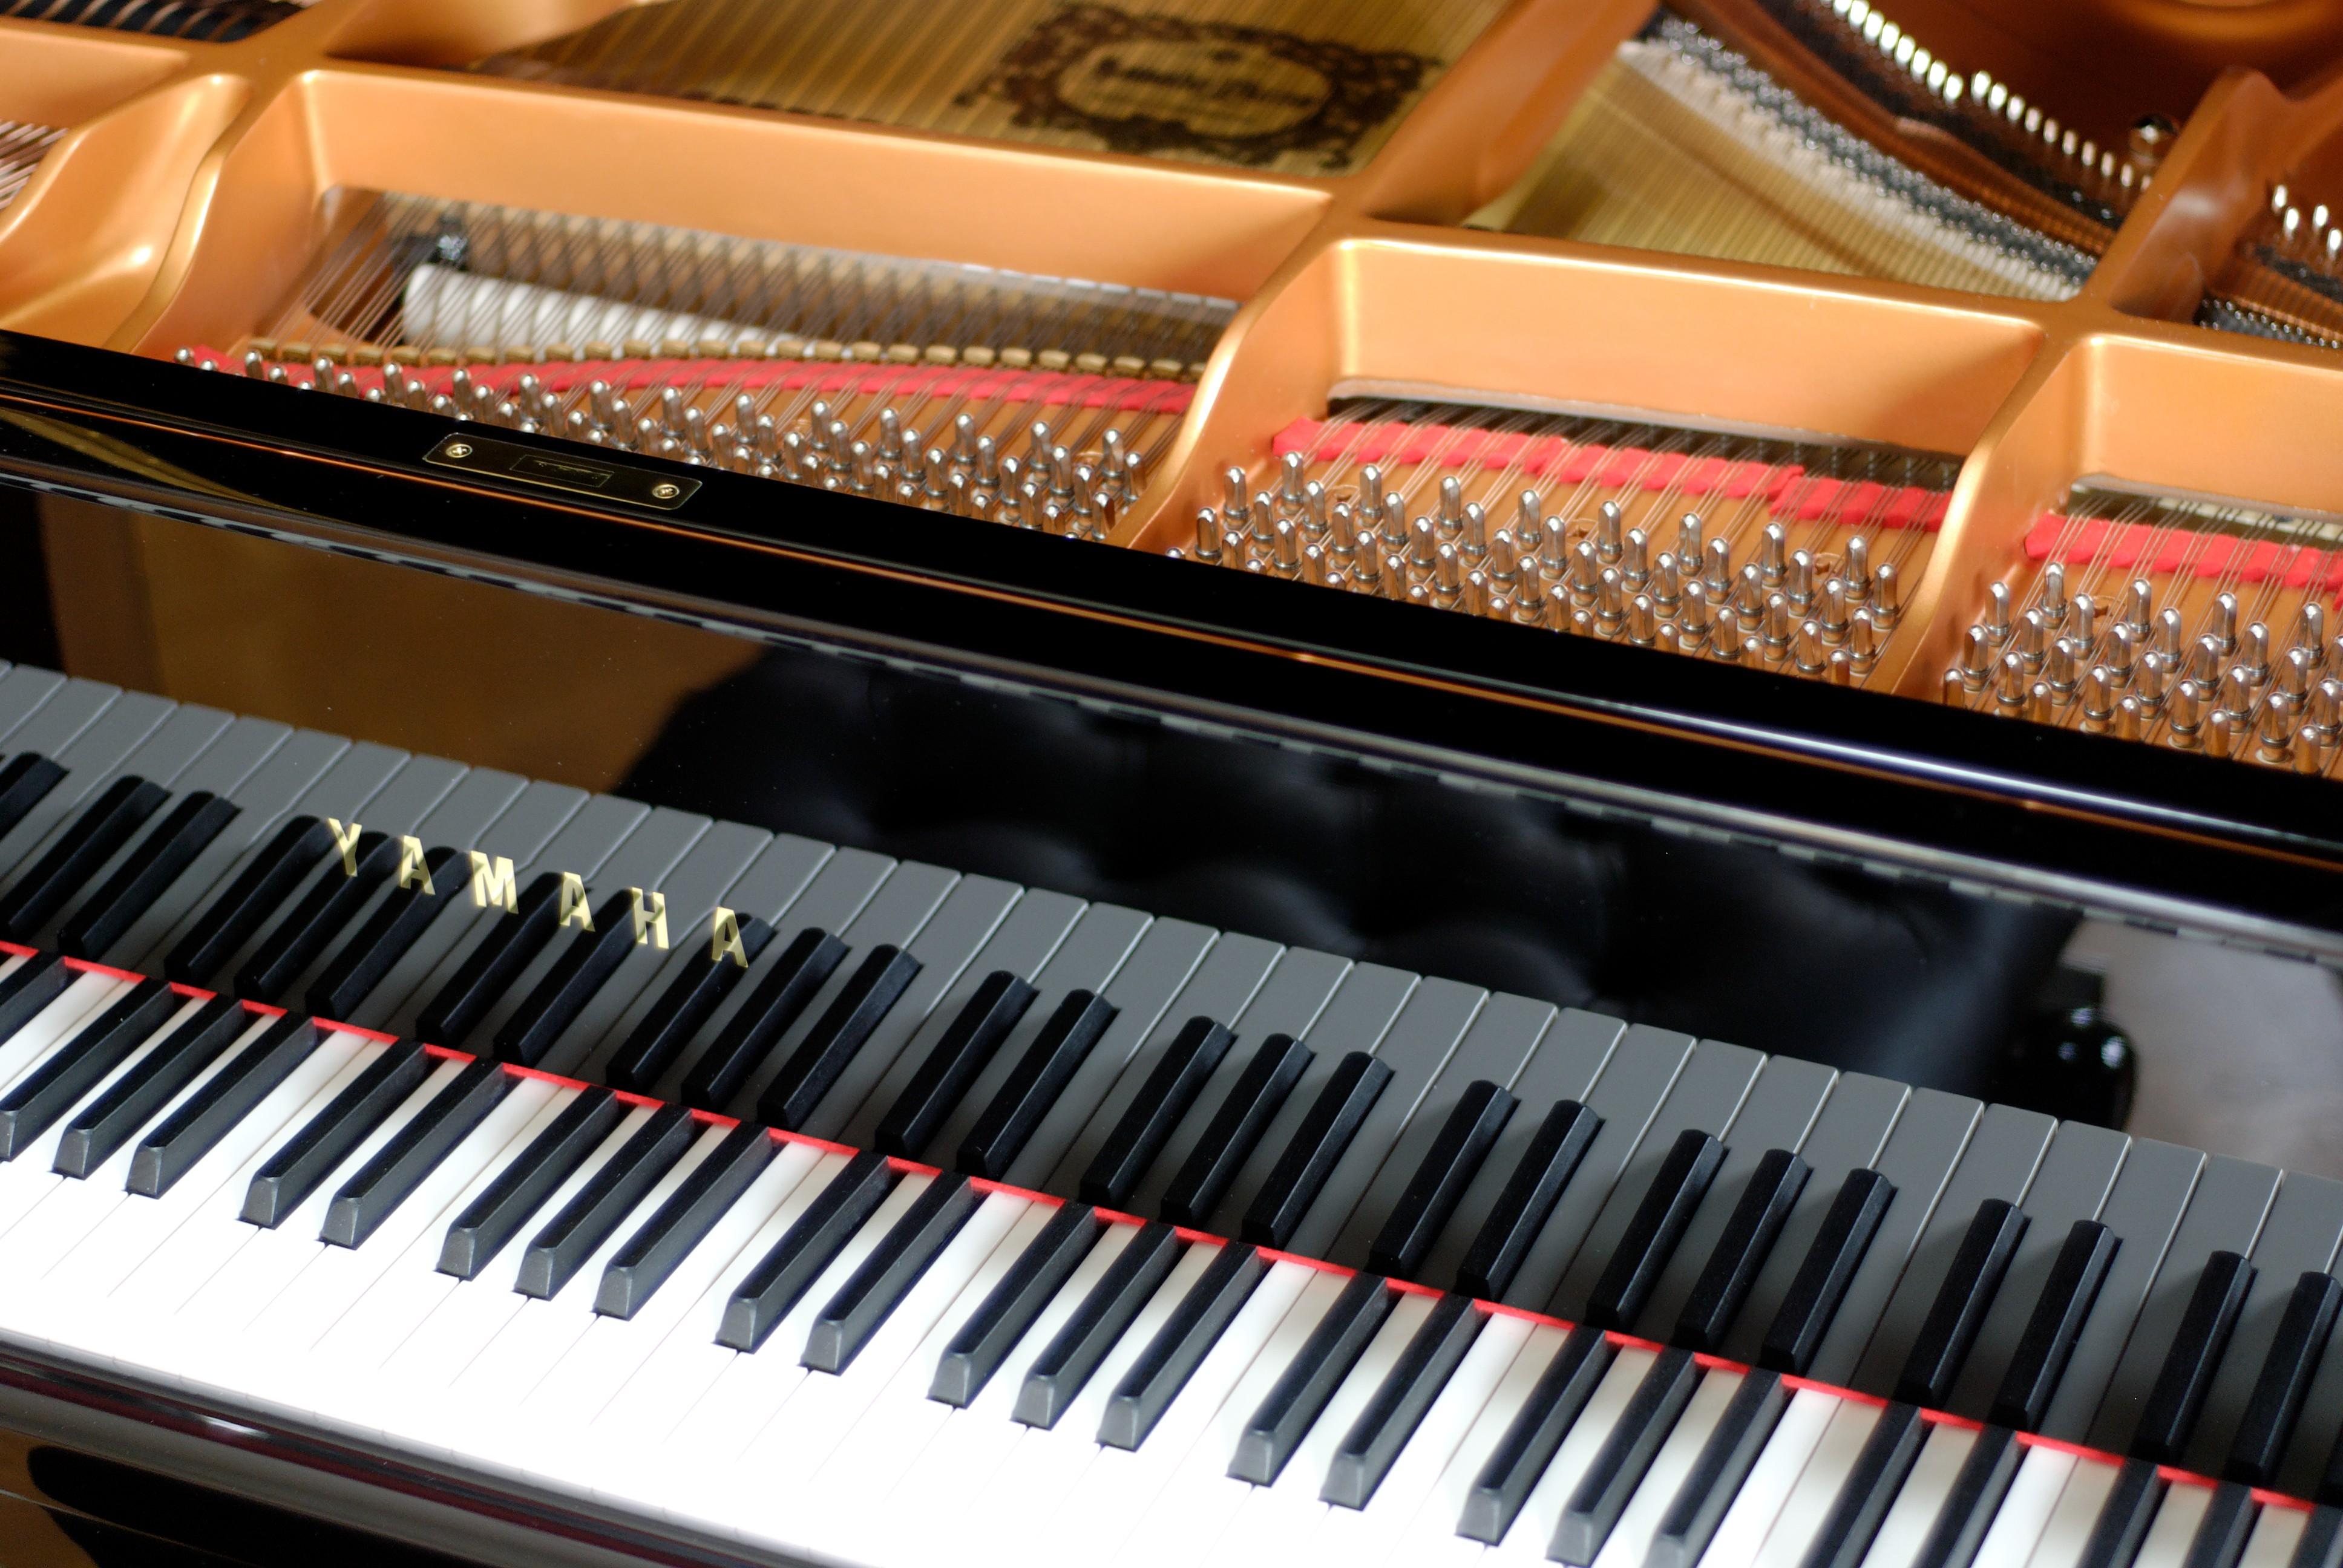 Yamaha c3 image 1767403 audiofanzine for Yamaha c3 piano review